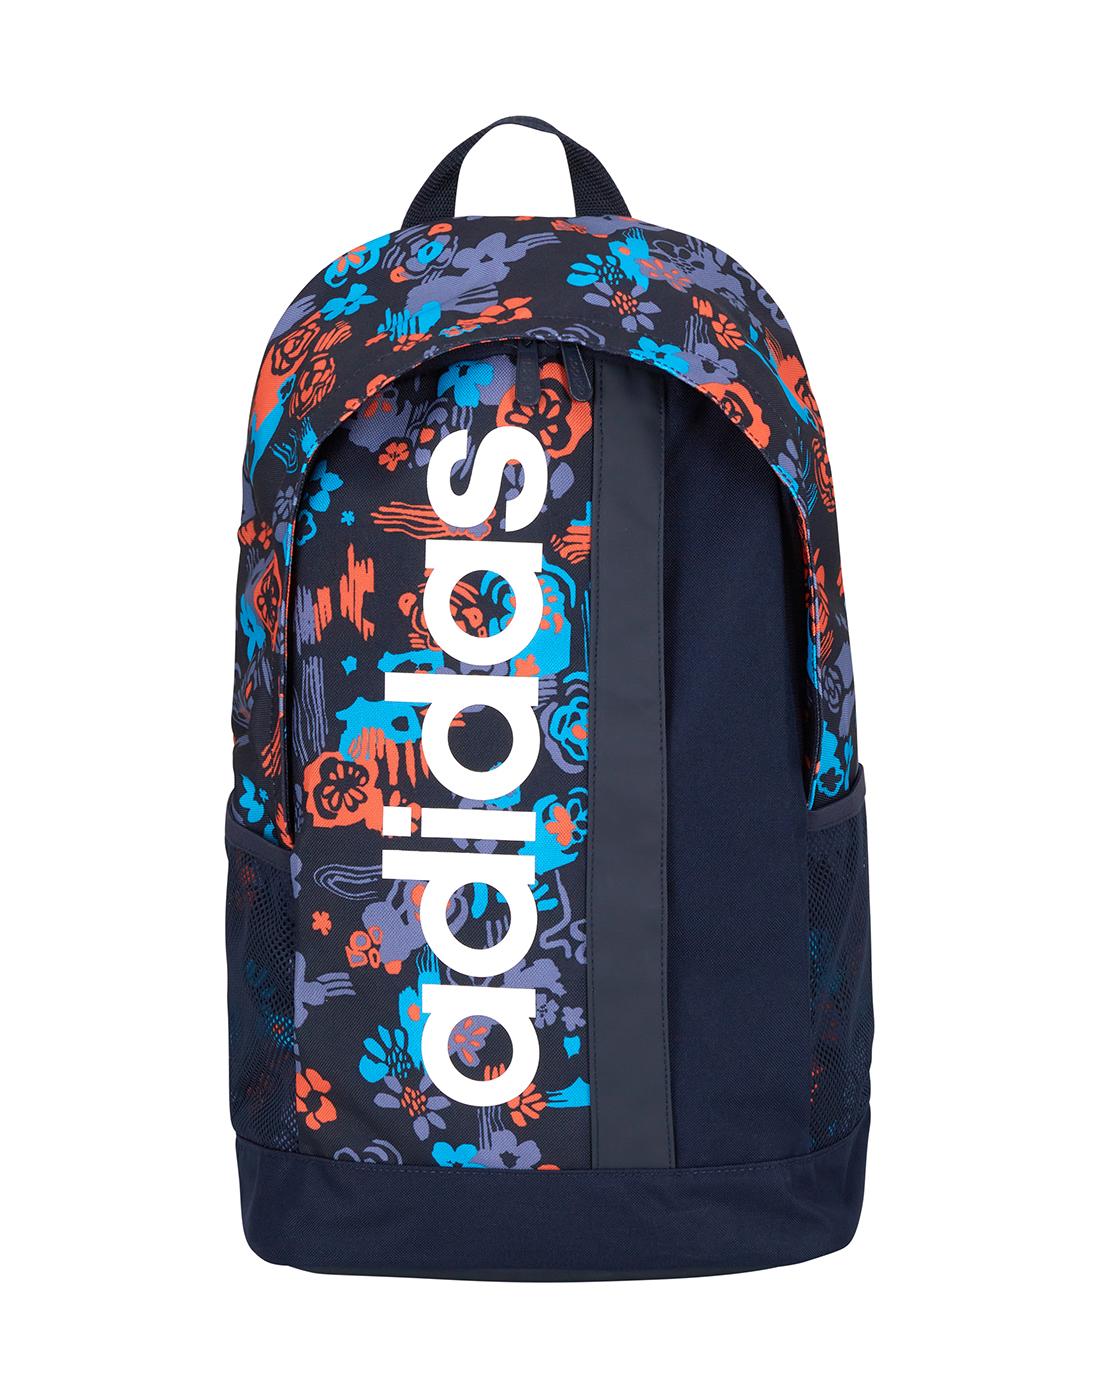 1e70ed9d80a adidas. Linear Floral Print Backpack. Linear Floral Print Backpack ...